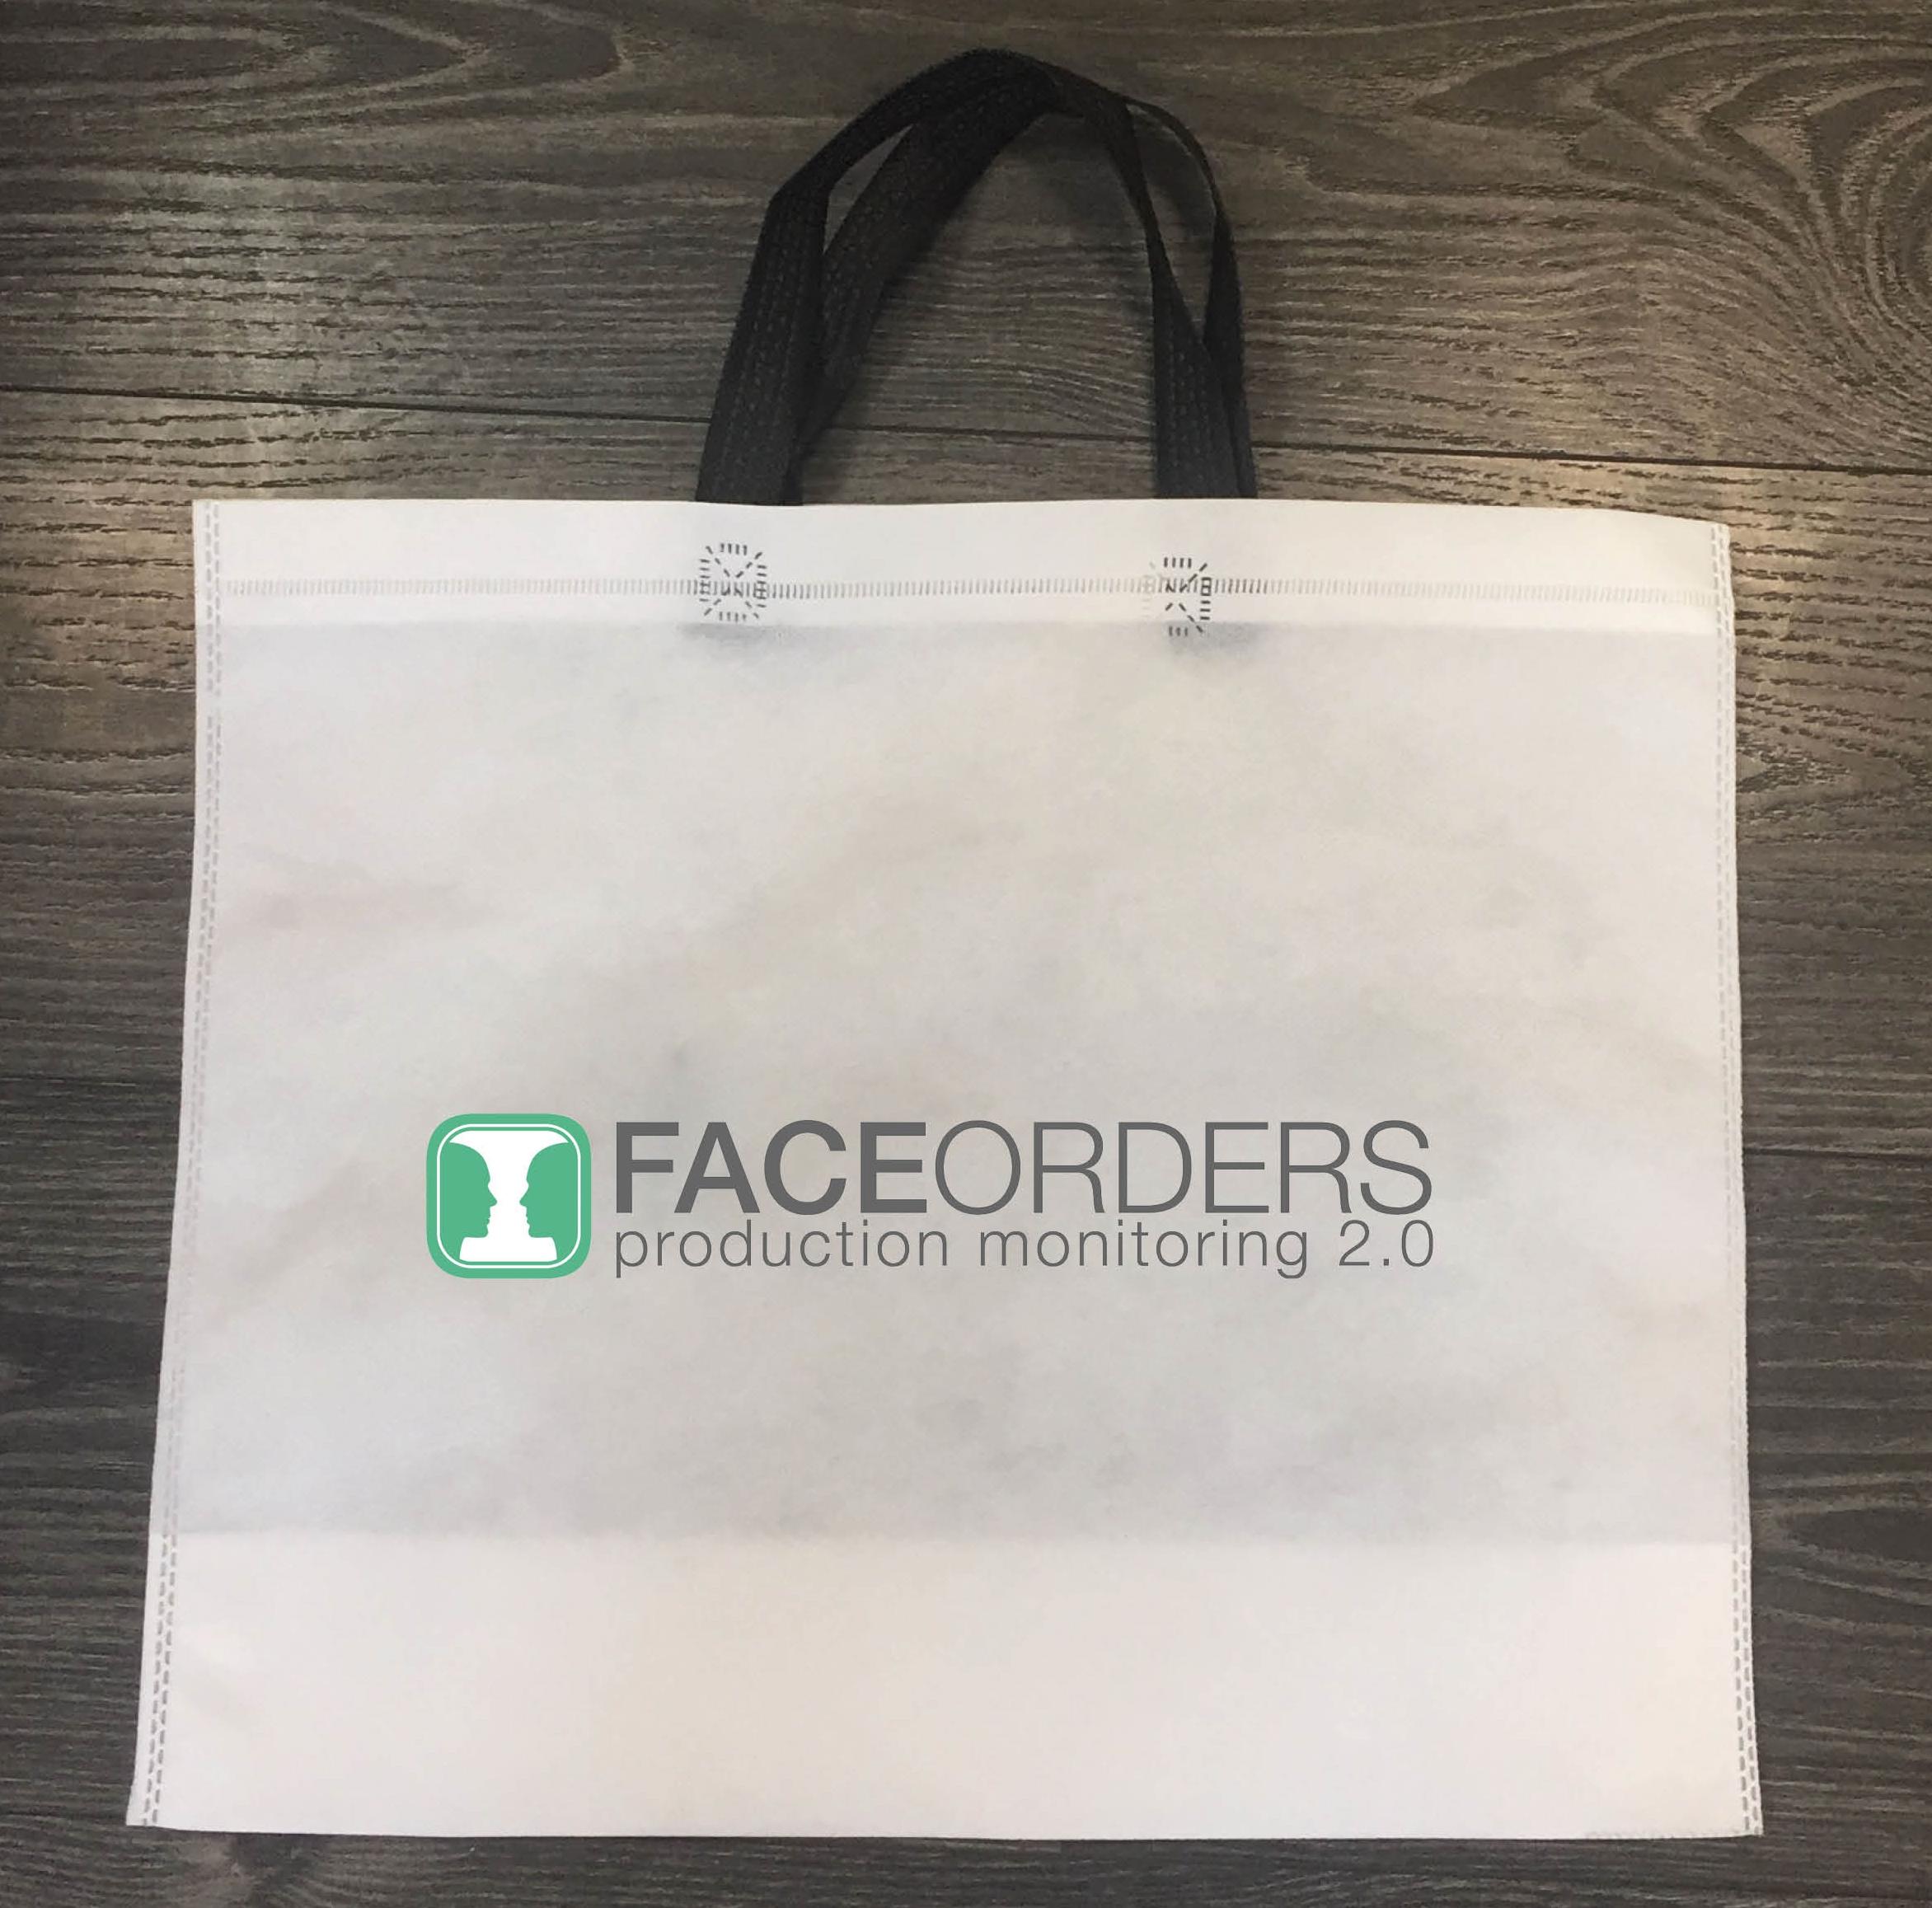 accessoires-FACE-ORDER-1503048958.jpg